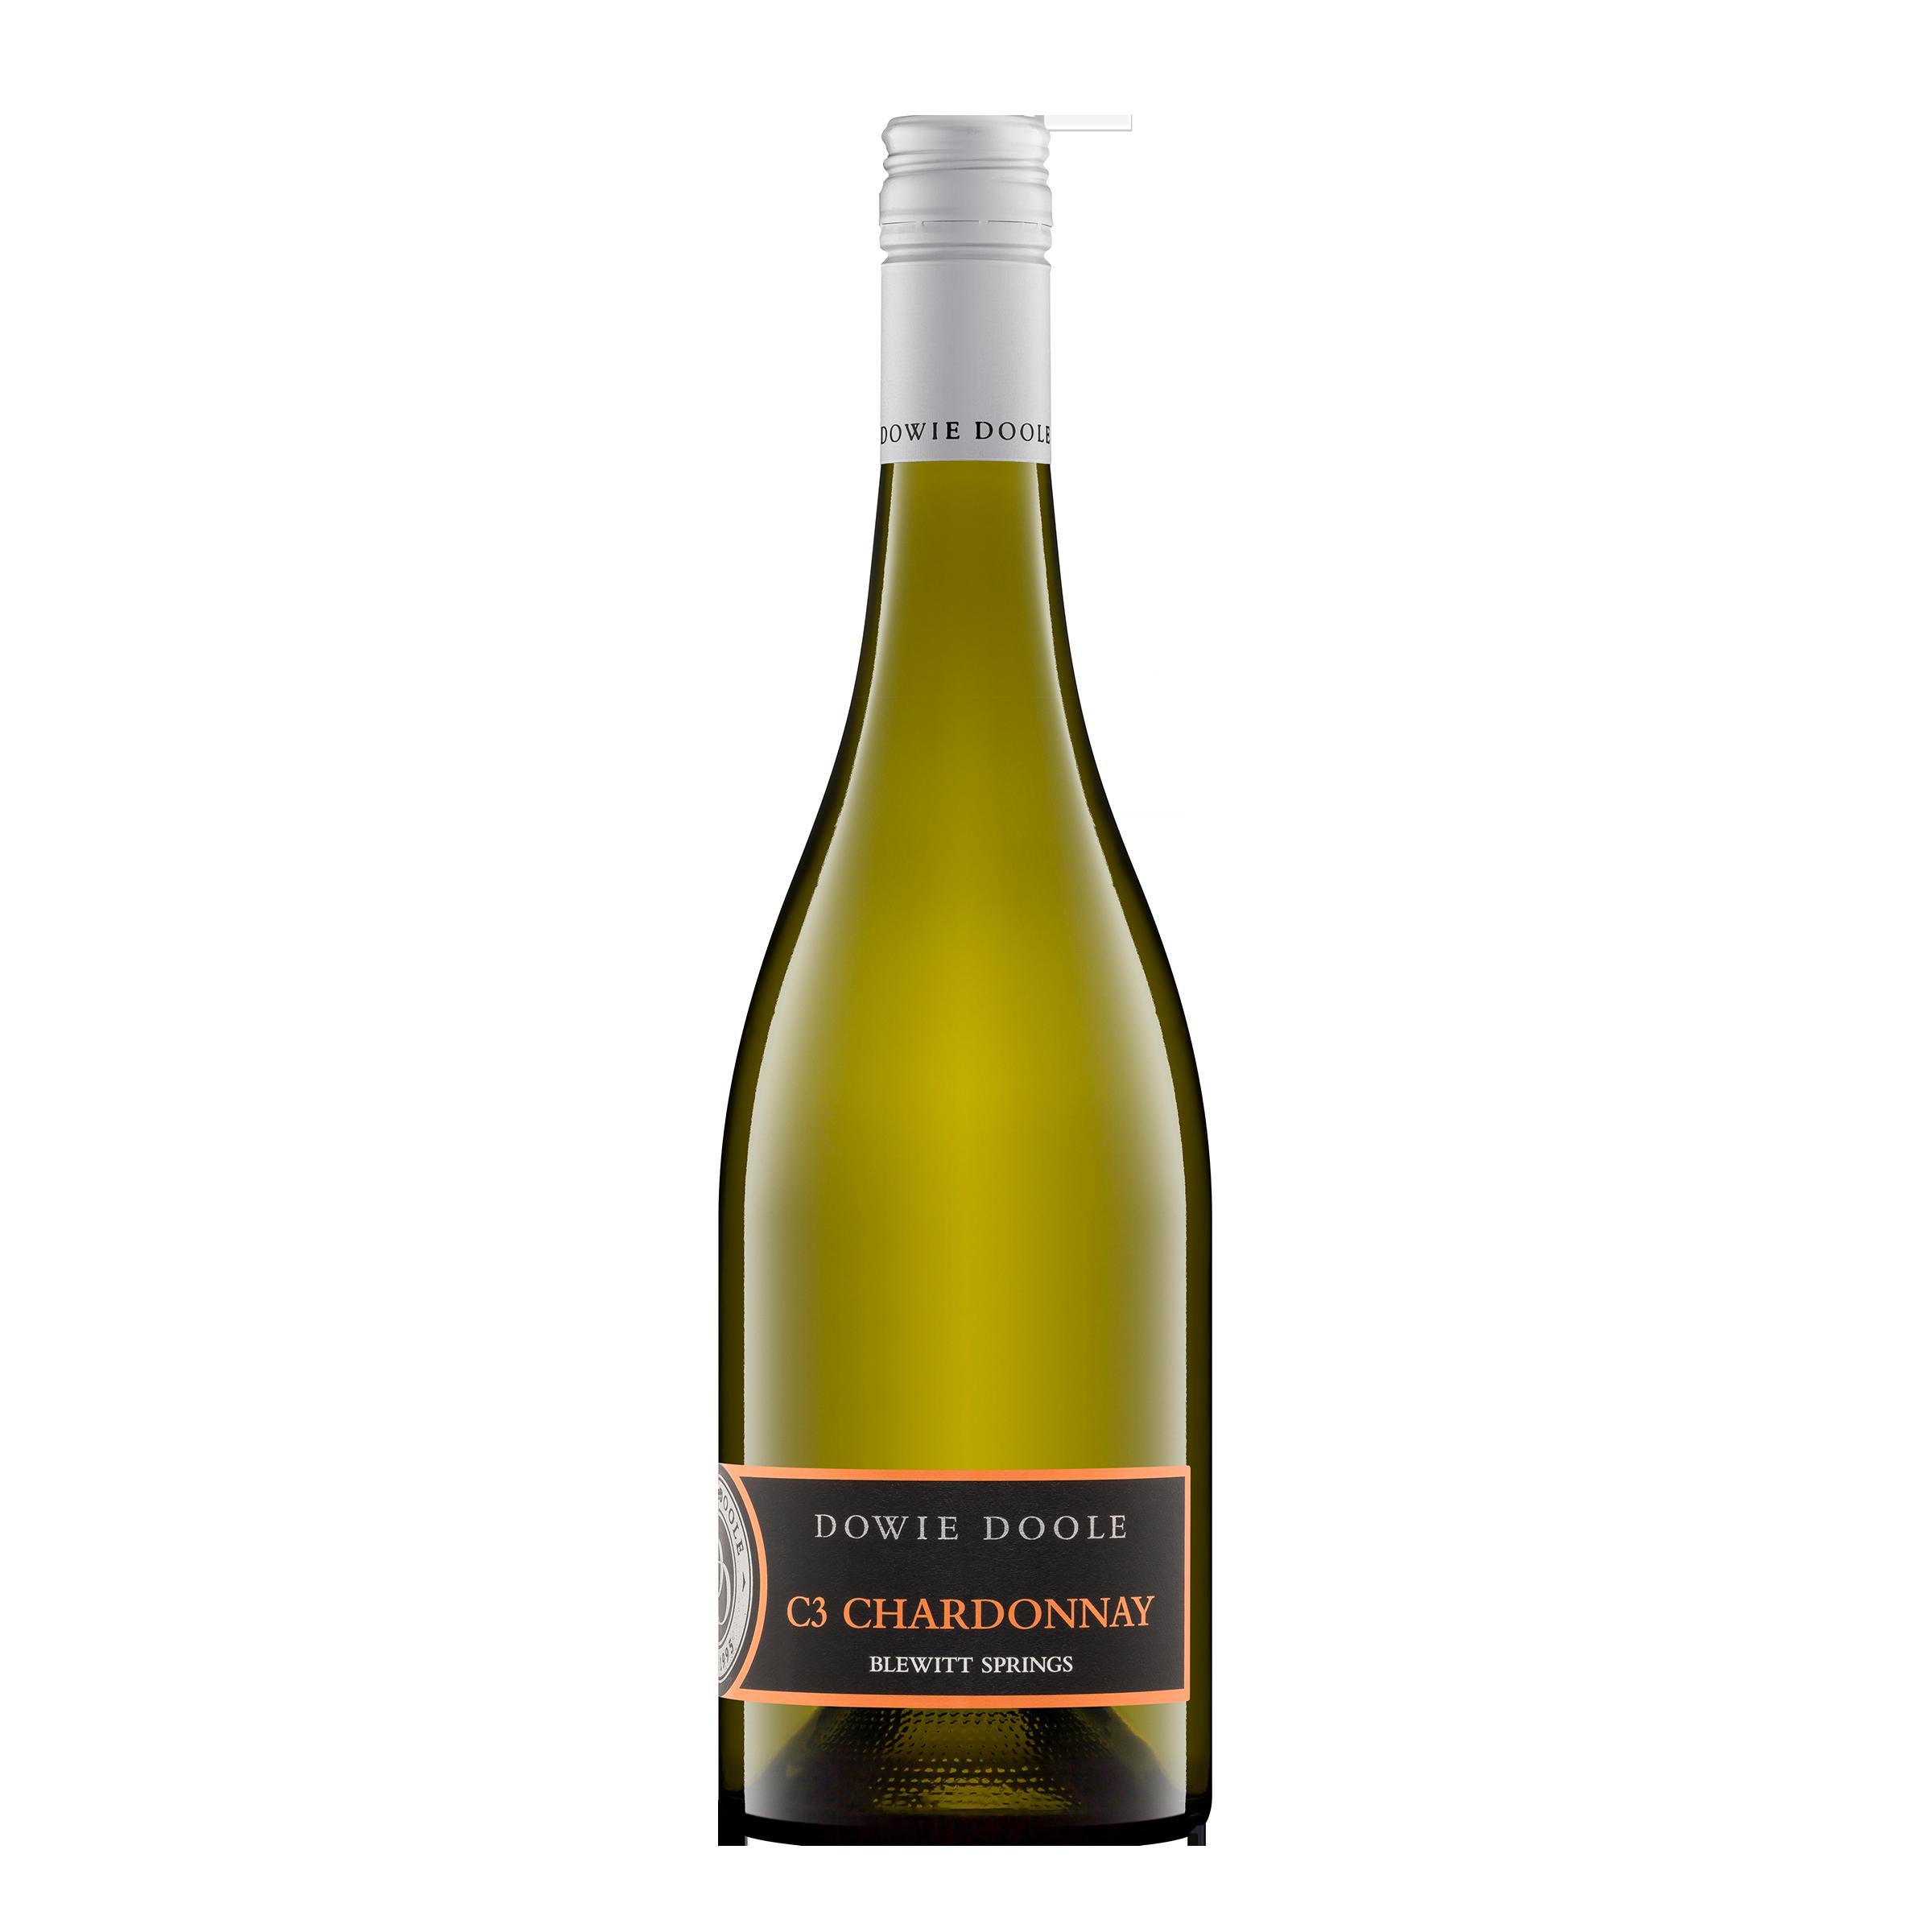 Dowie Doole Indi C3 Chardonnay